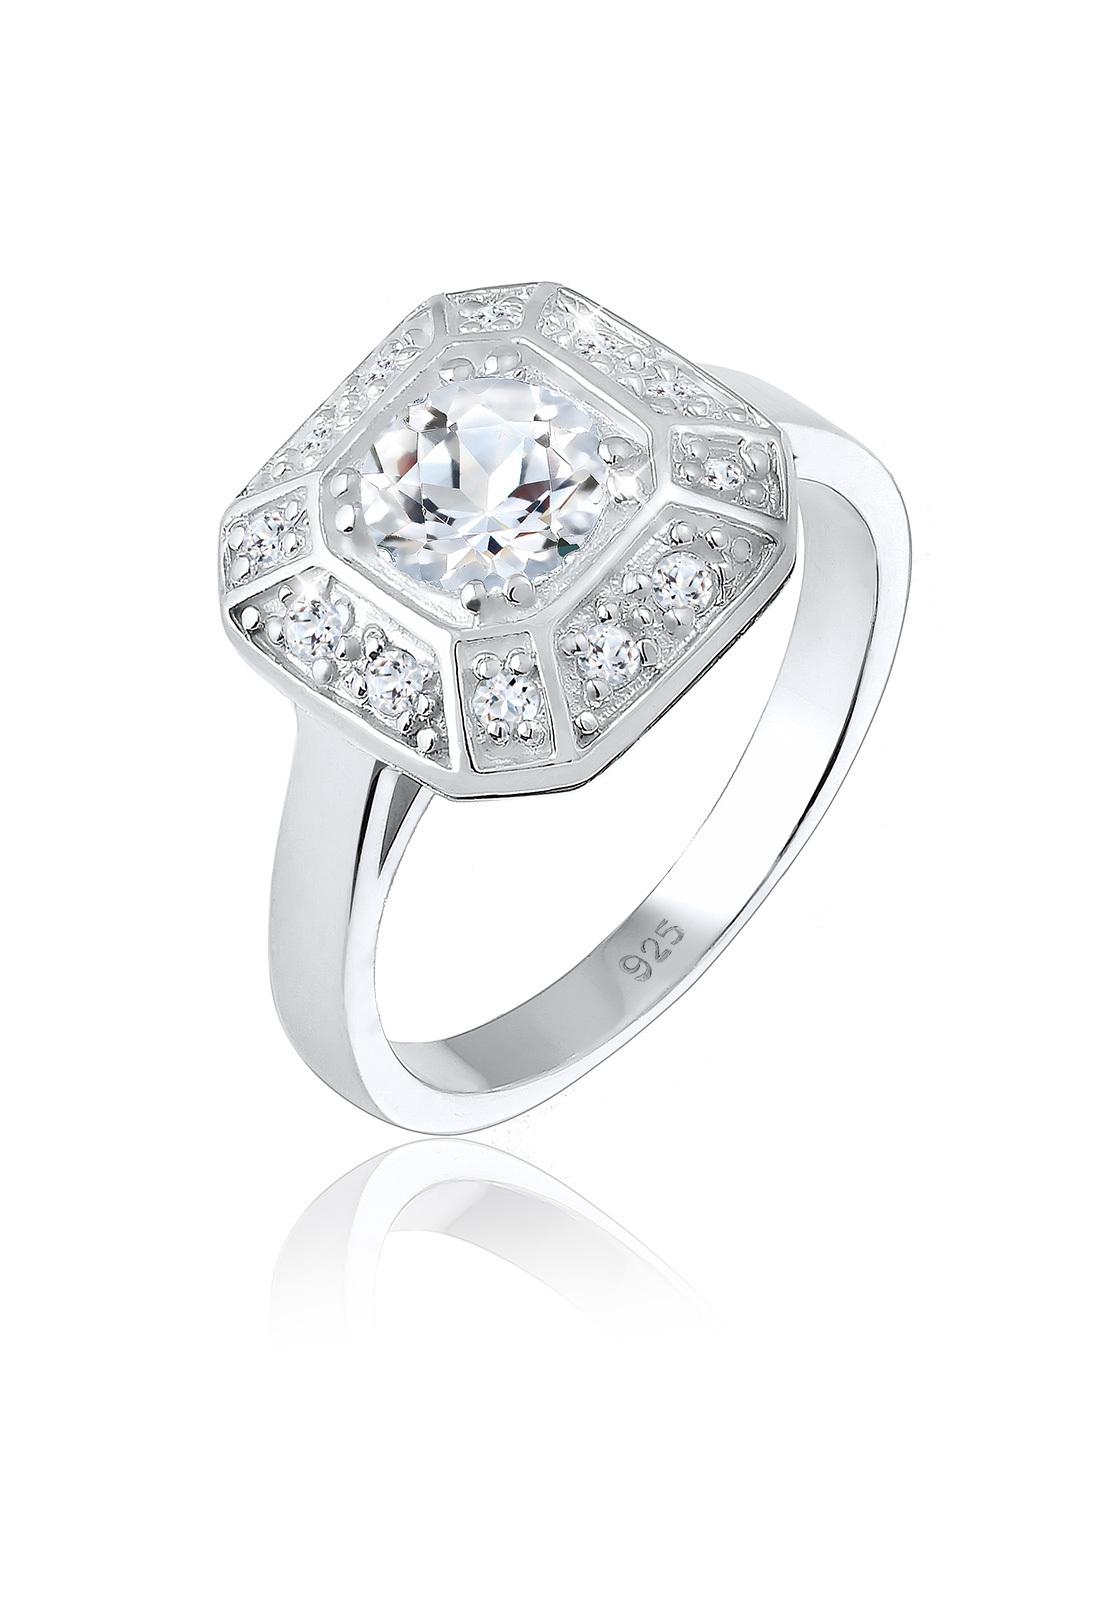 Verlobungsring | Topas ( Weiß ) | 925er Sterling Silber